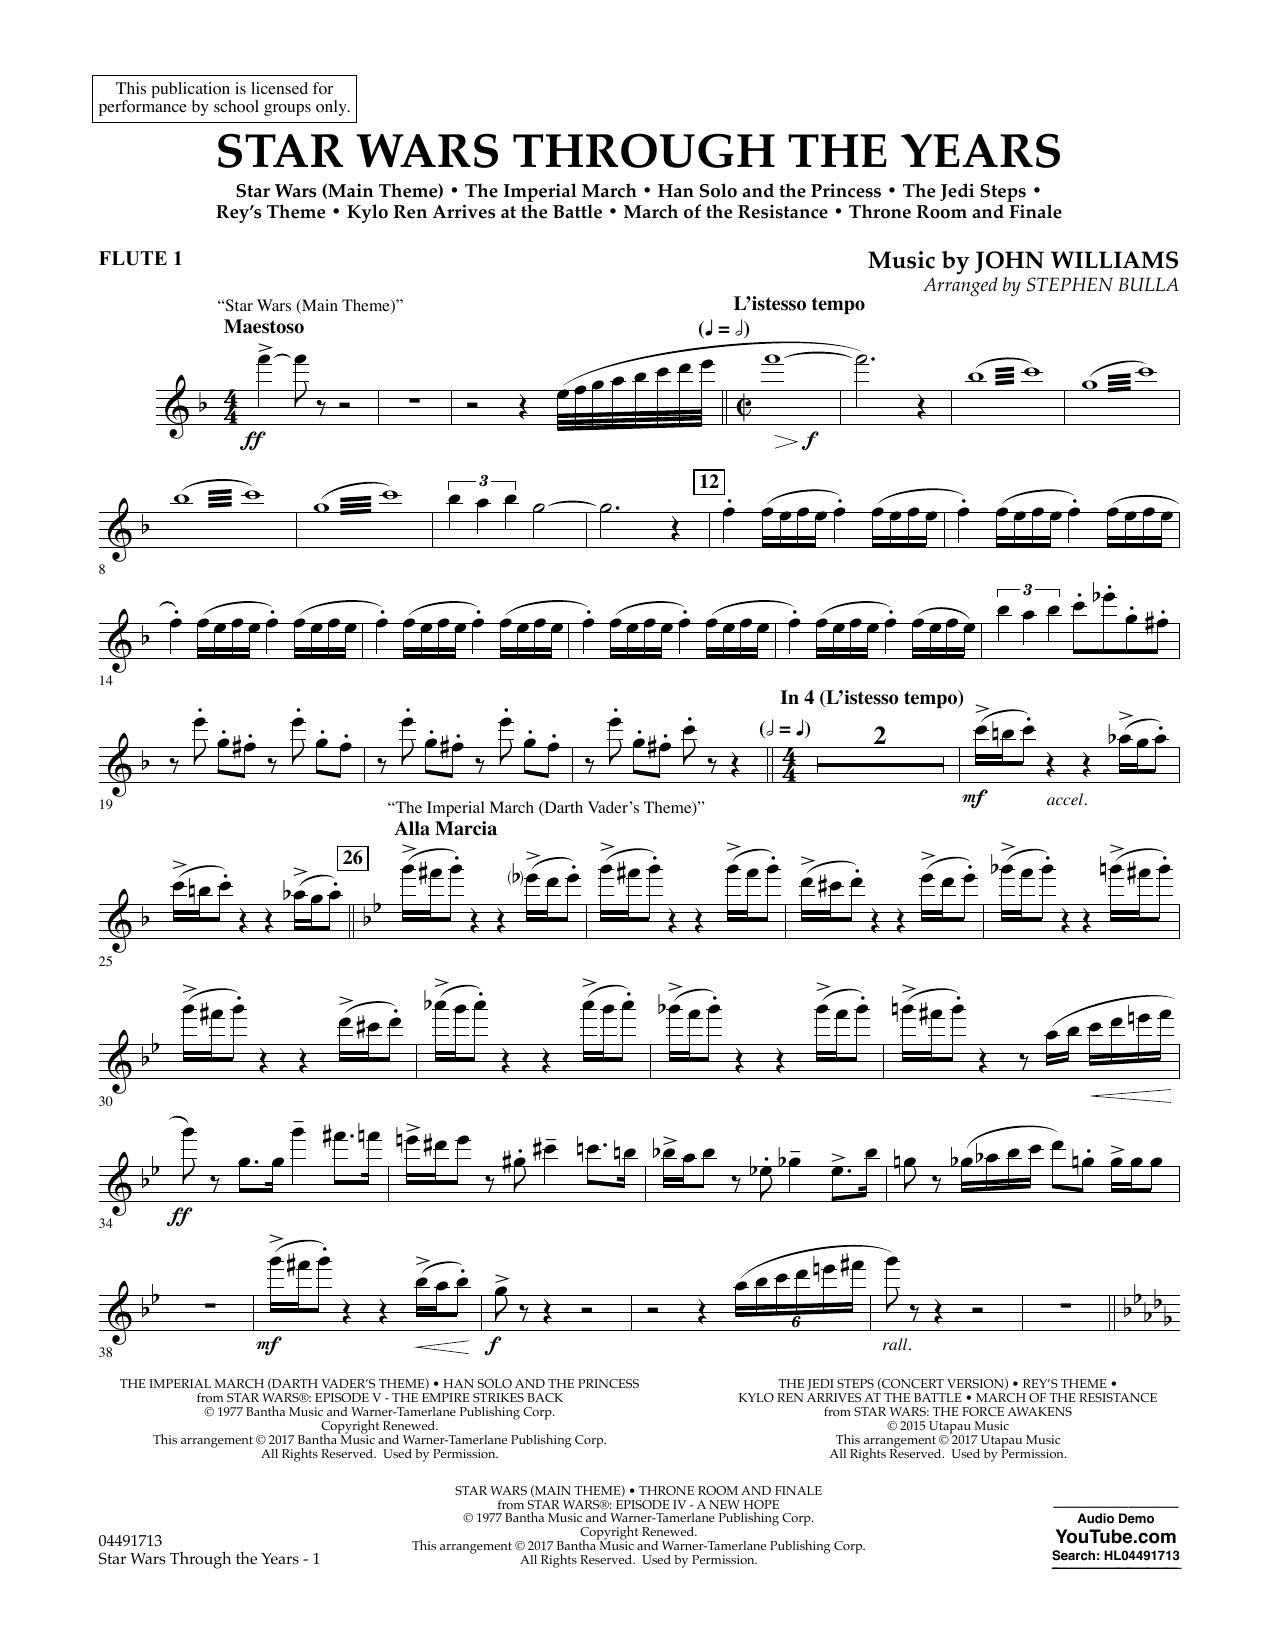 Star Wars Through the Years - Flute 1 Sheet Music